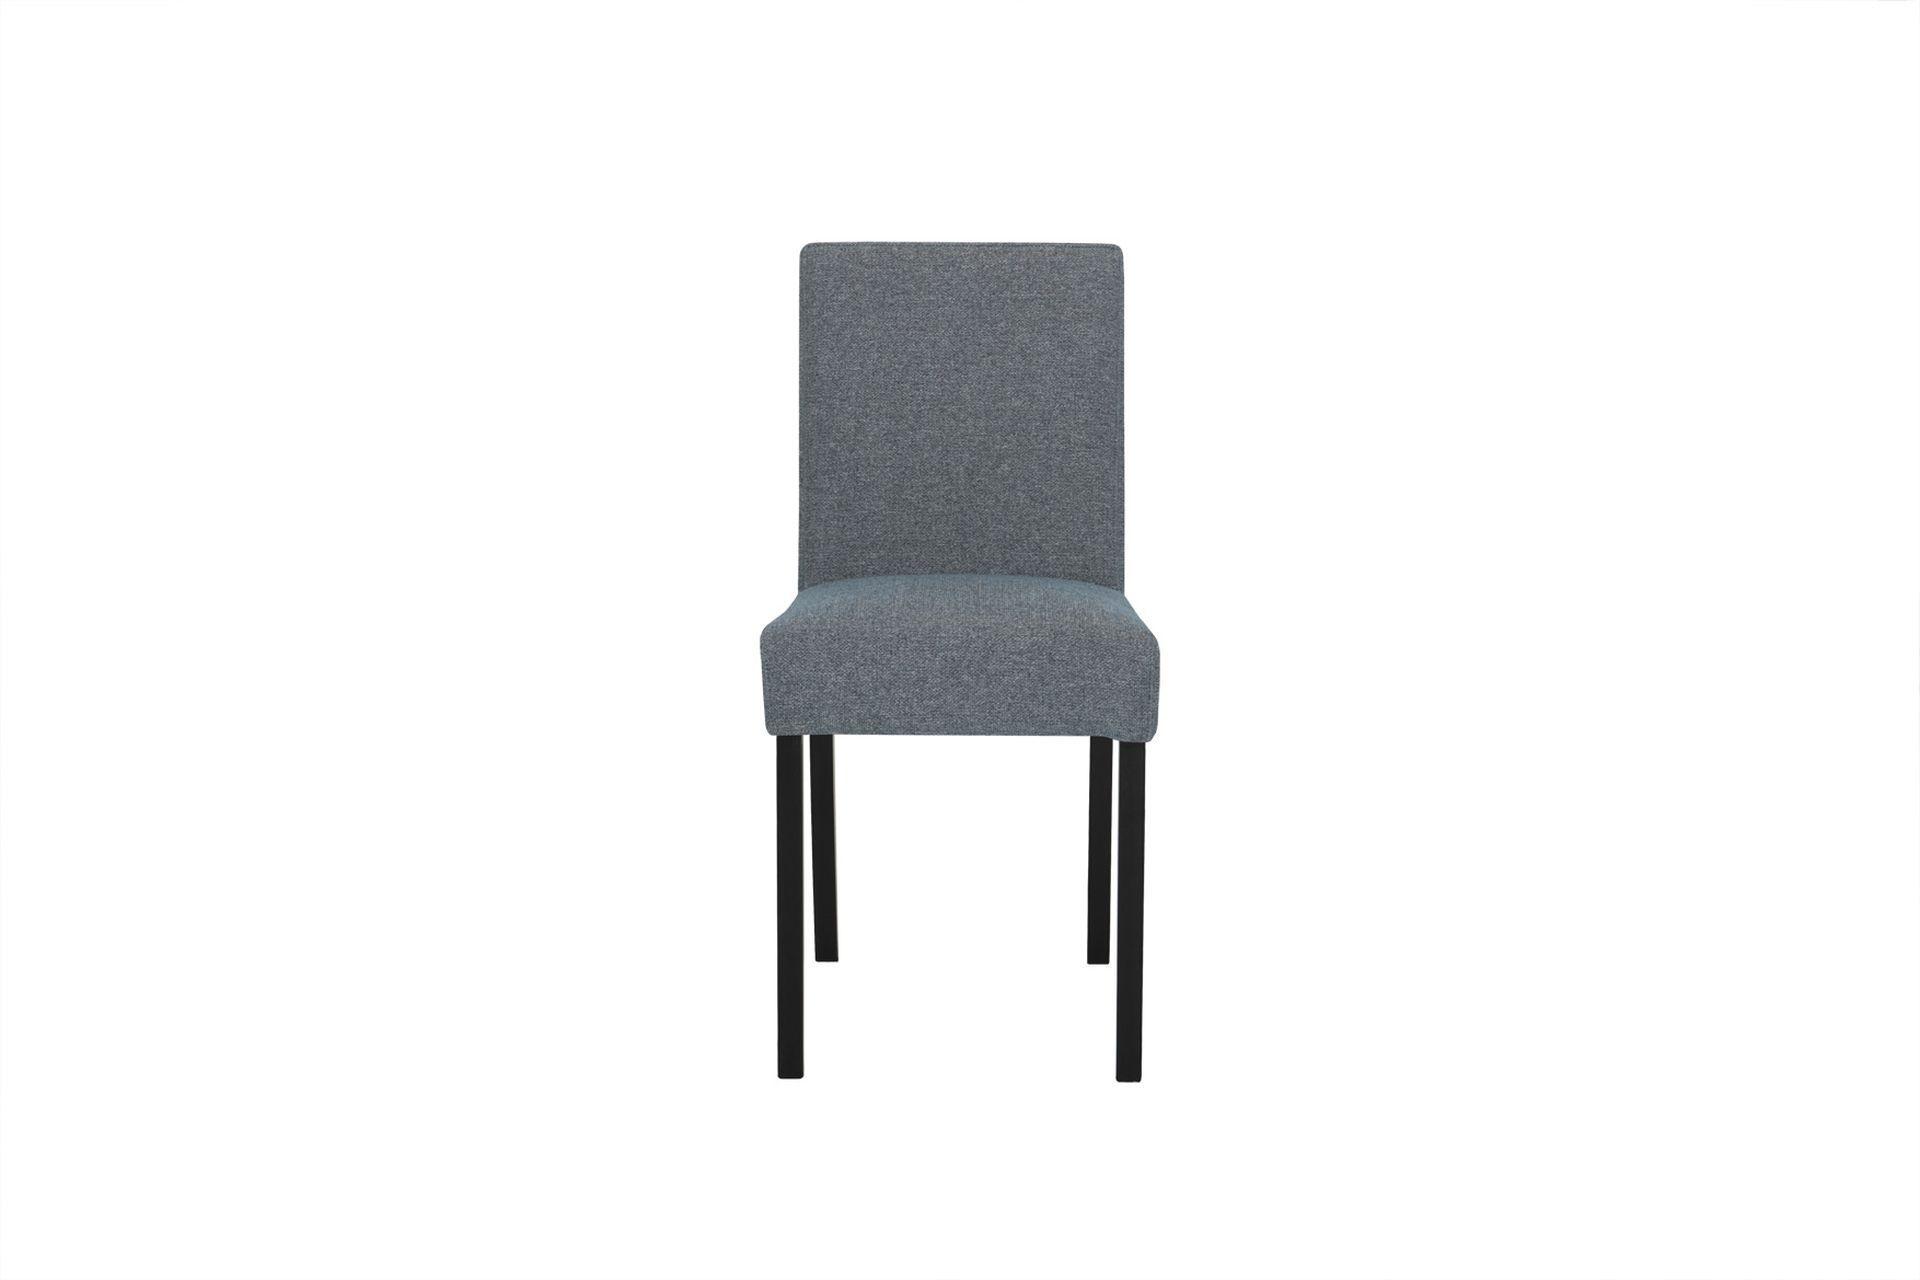 Кухонный стул Sits 15447051 от thefurnish